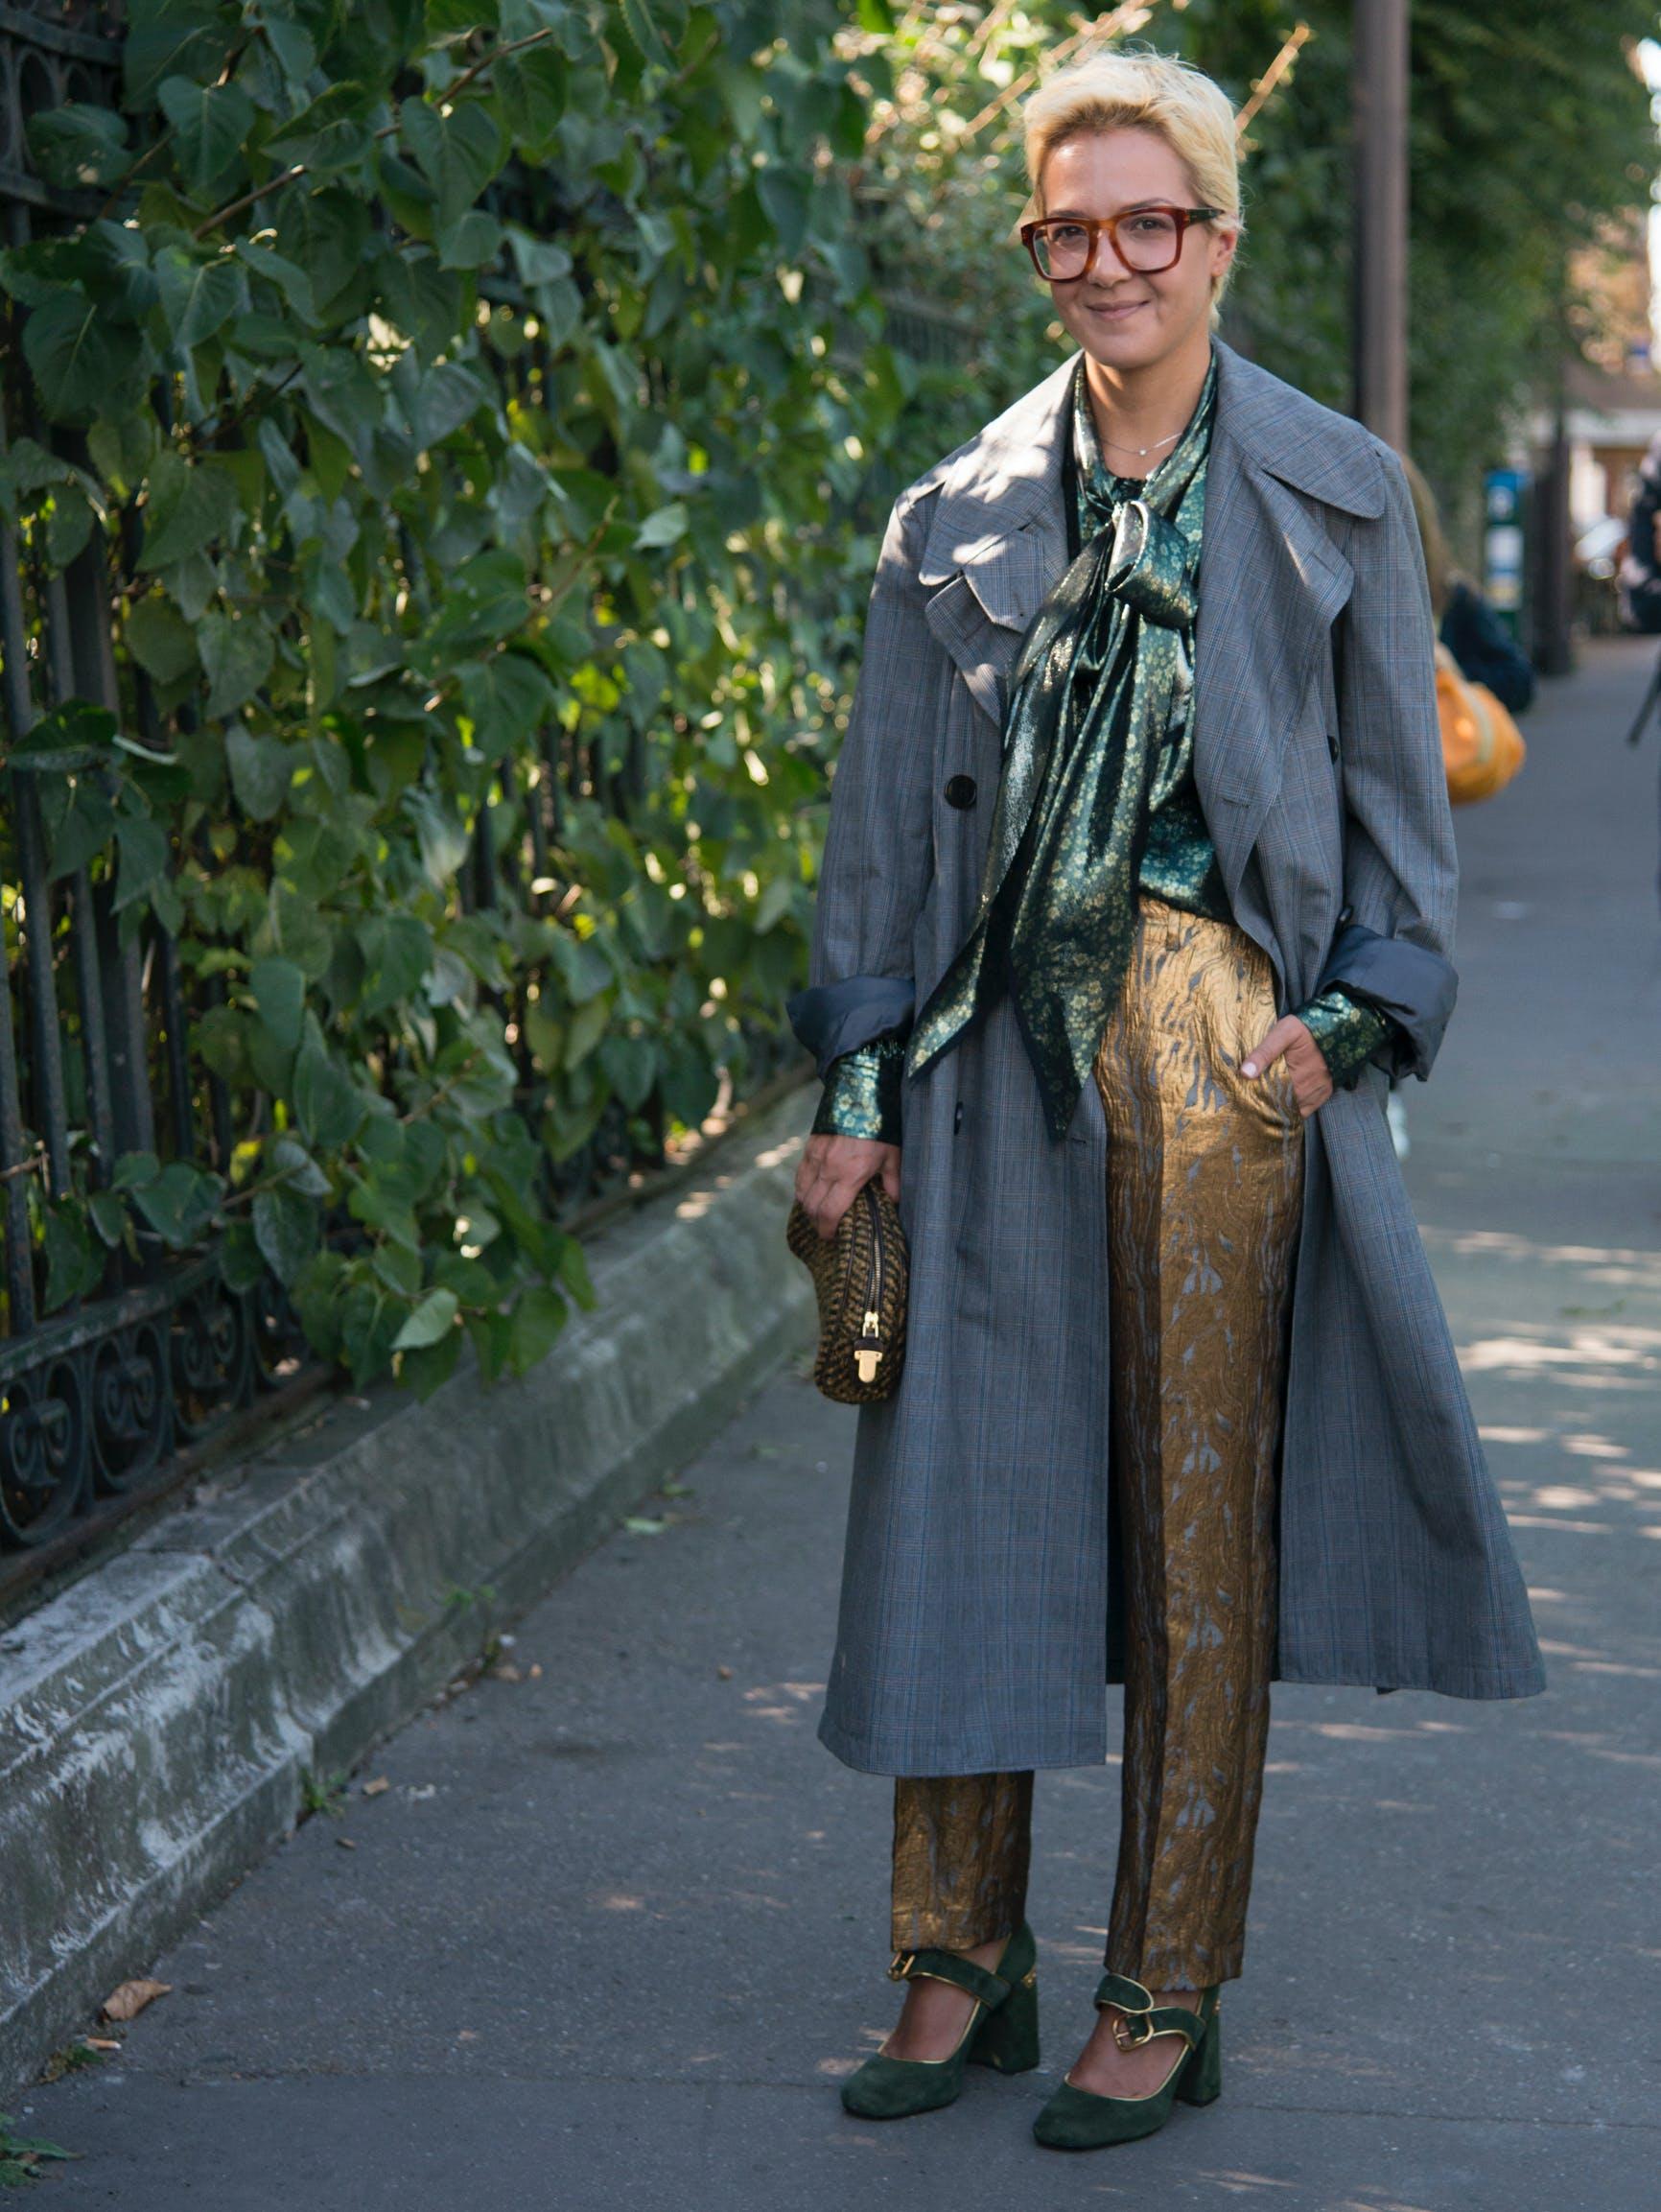 woman wearing a silk top and metallic pants